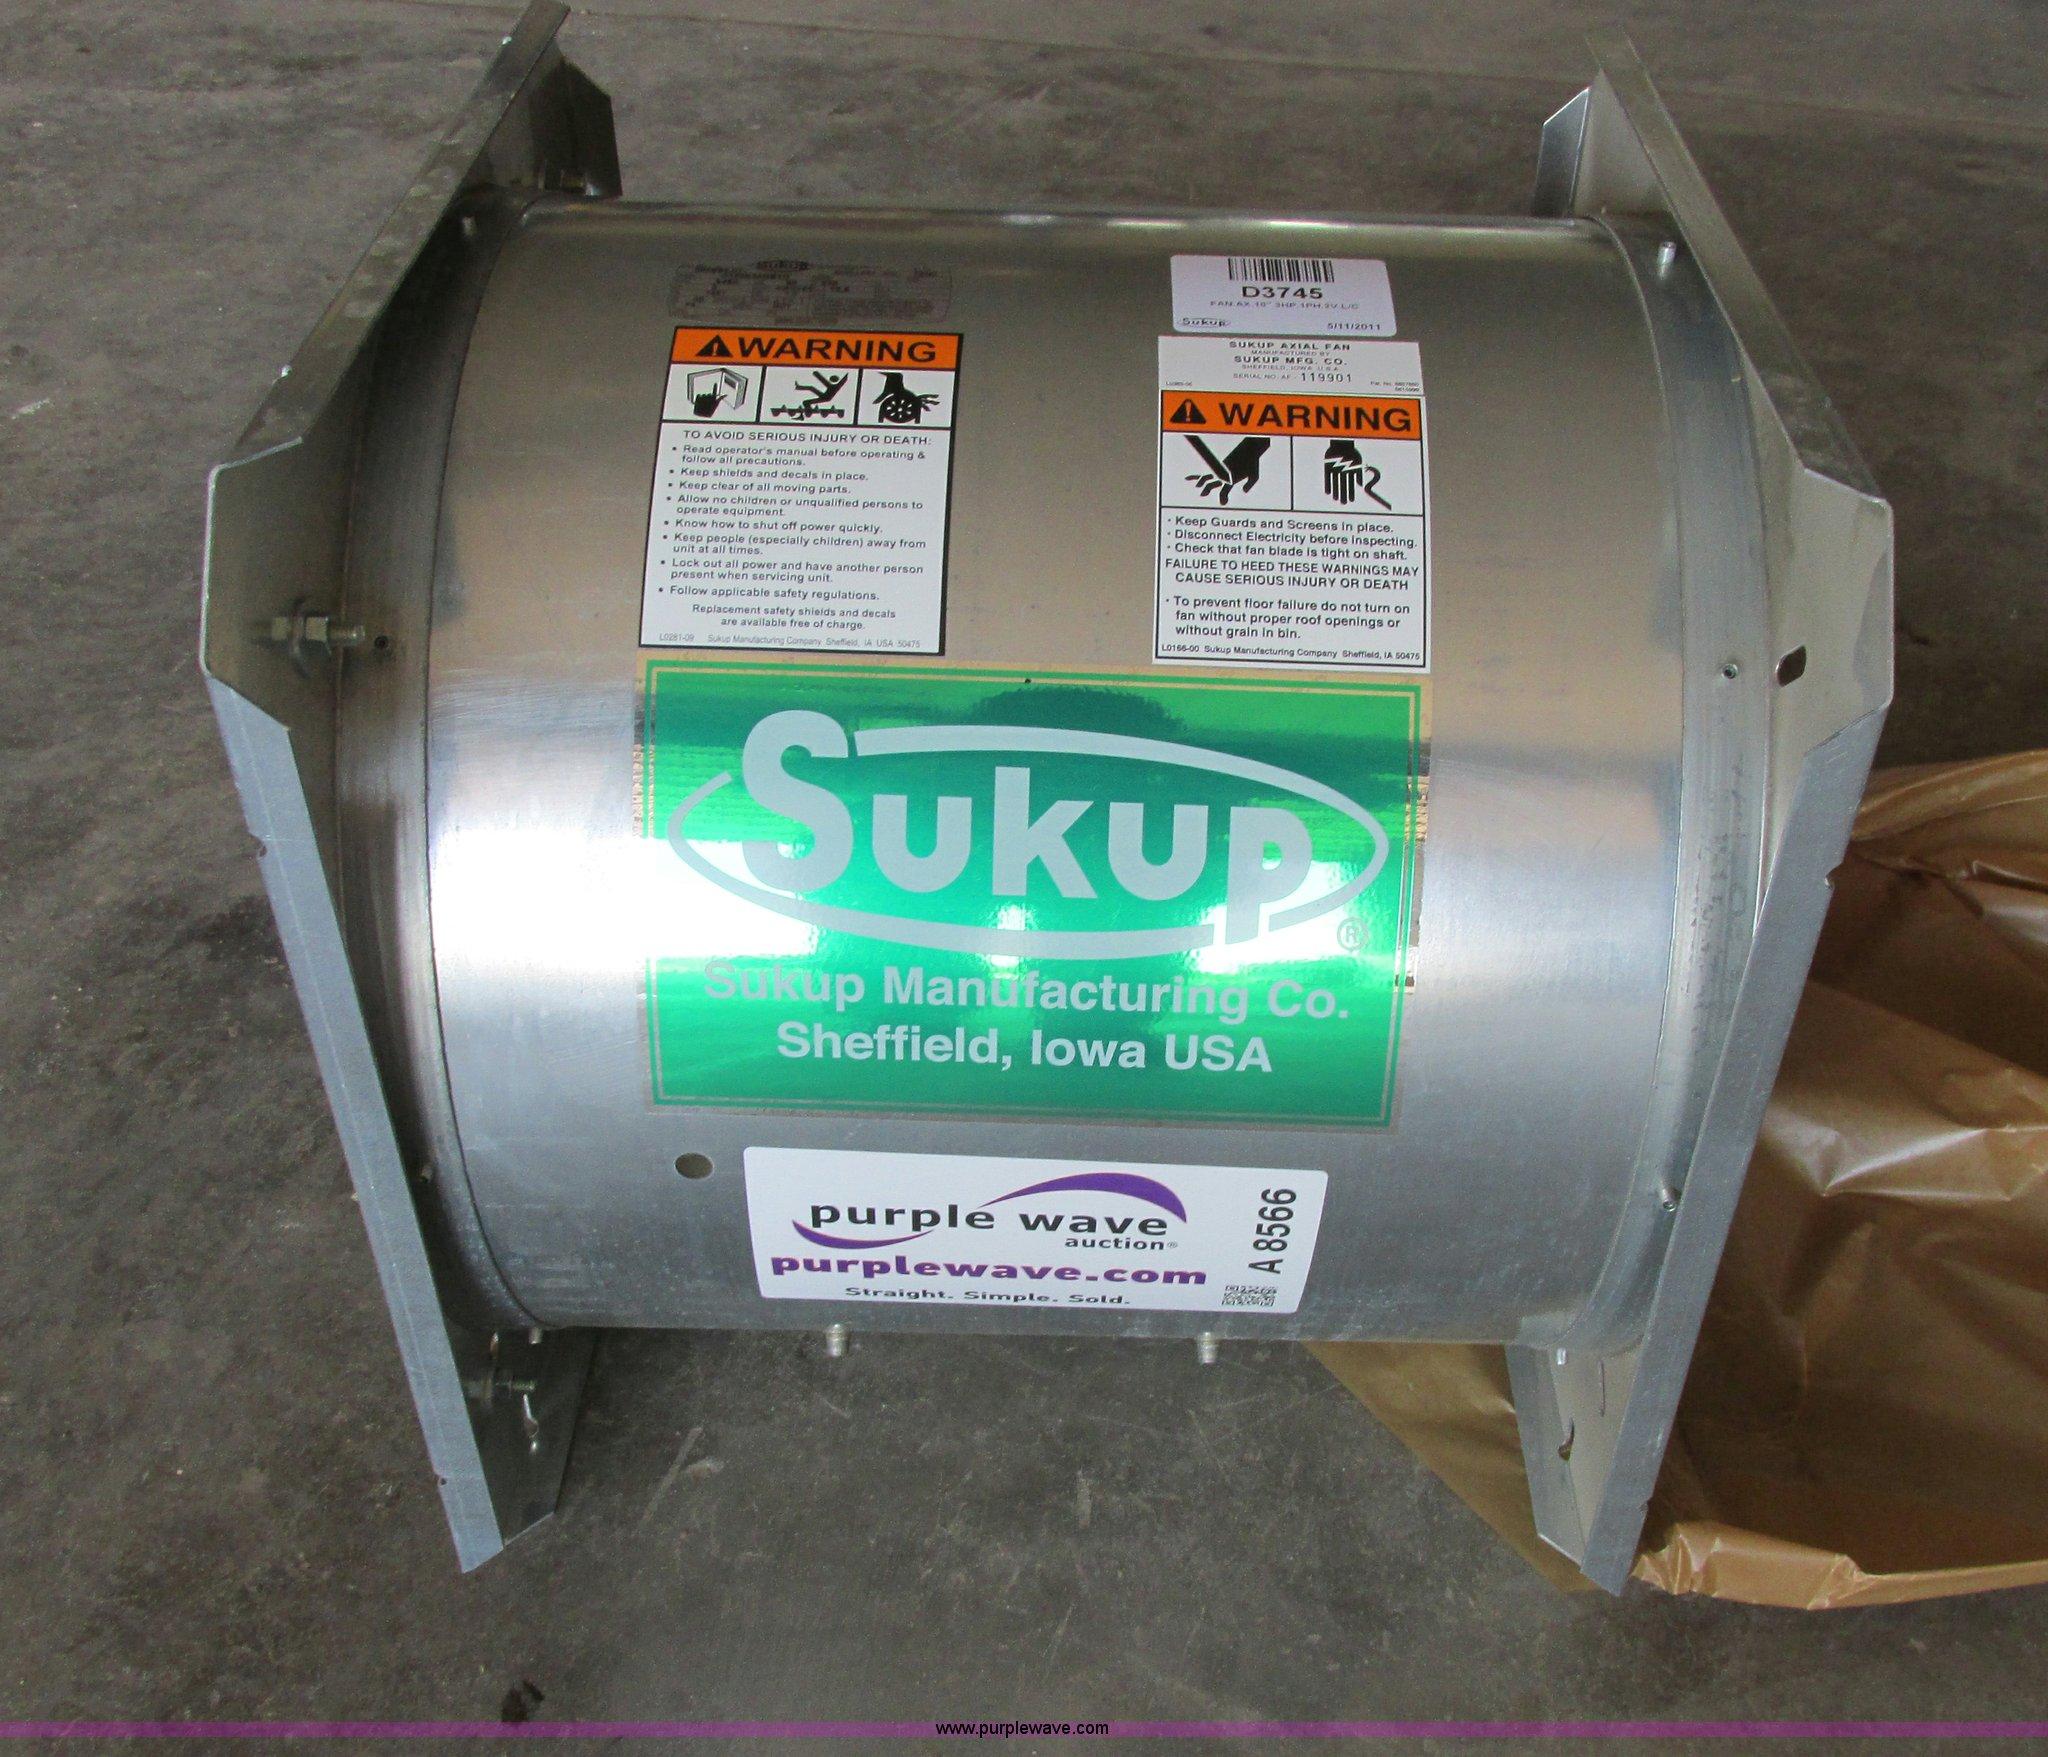 Sukup Parts Manual 220v Wiring Diagram 2 4 Array Grain Bin Fan Item A8566 Sold July 10 Ag Equipmen Rh Purplewave Com